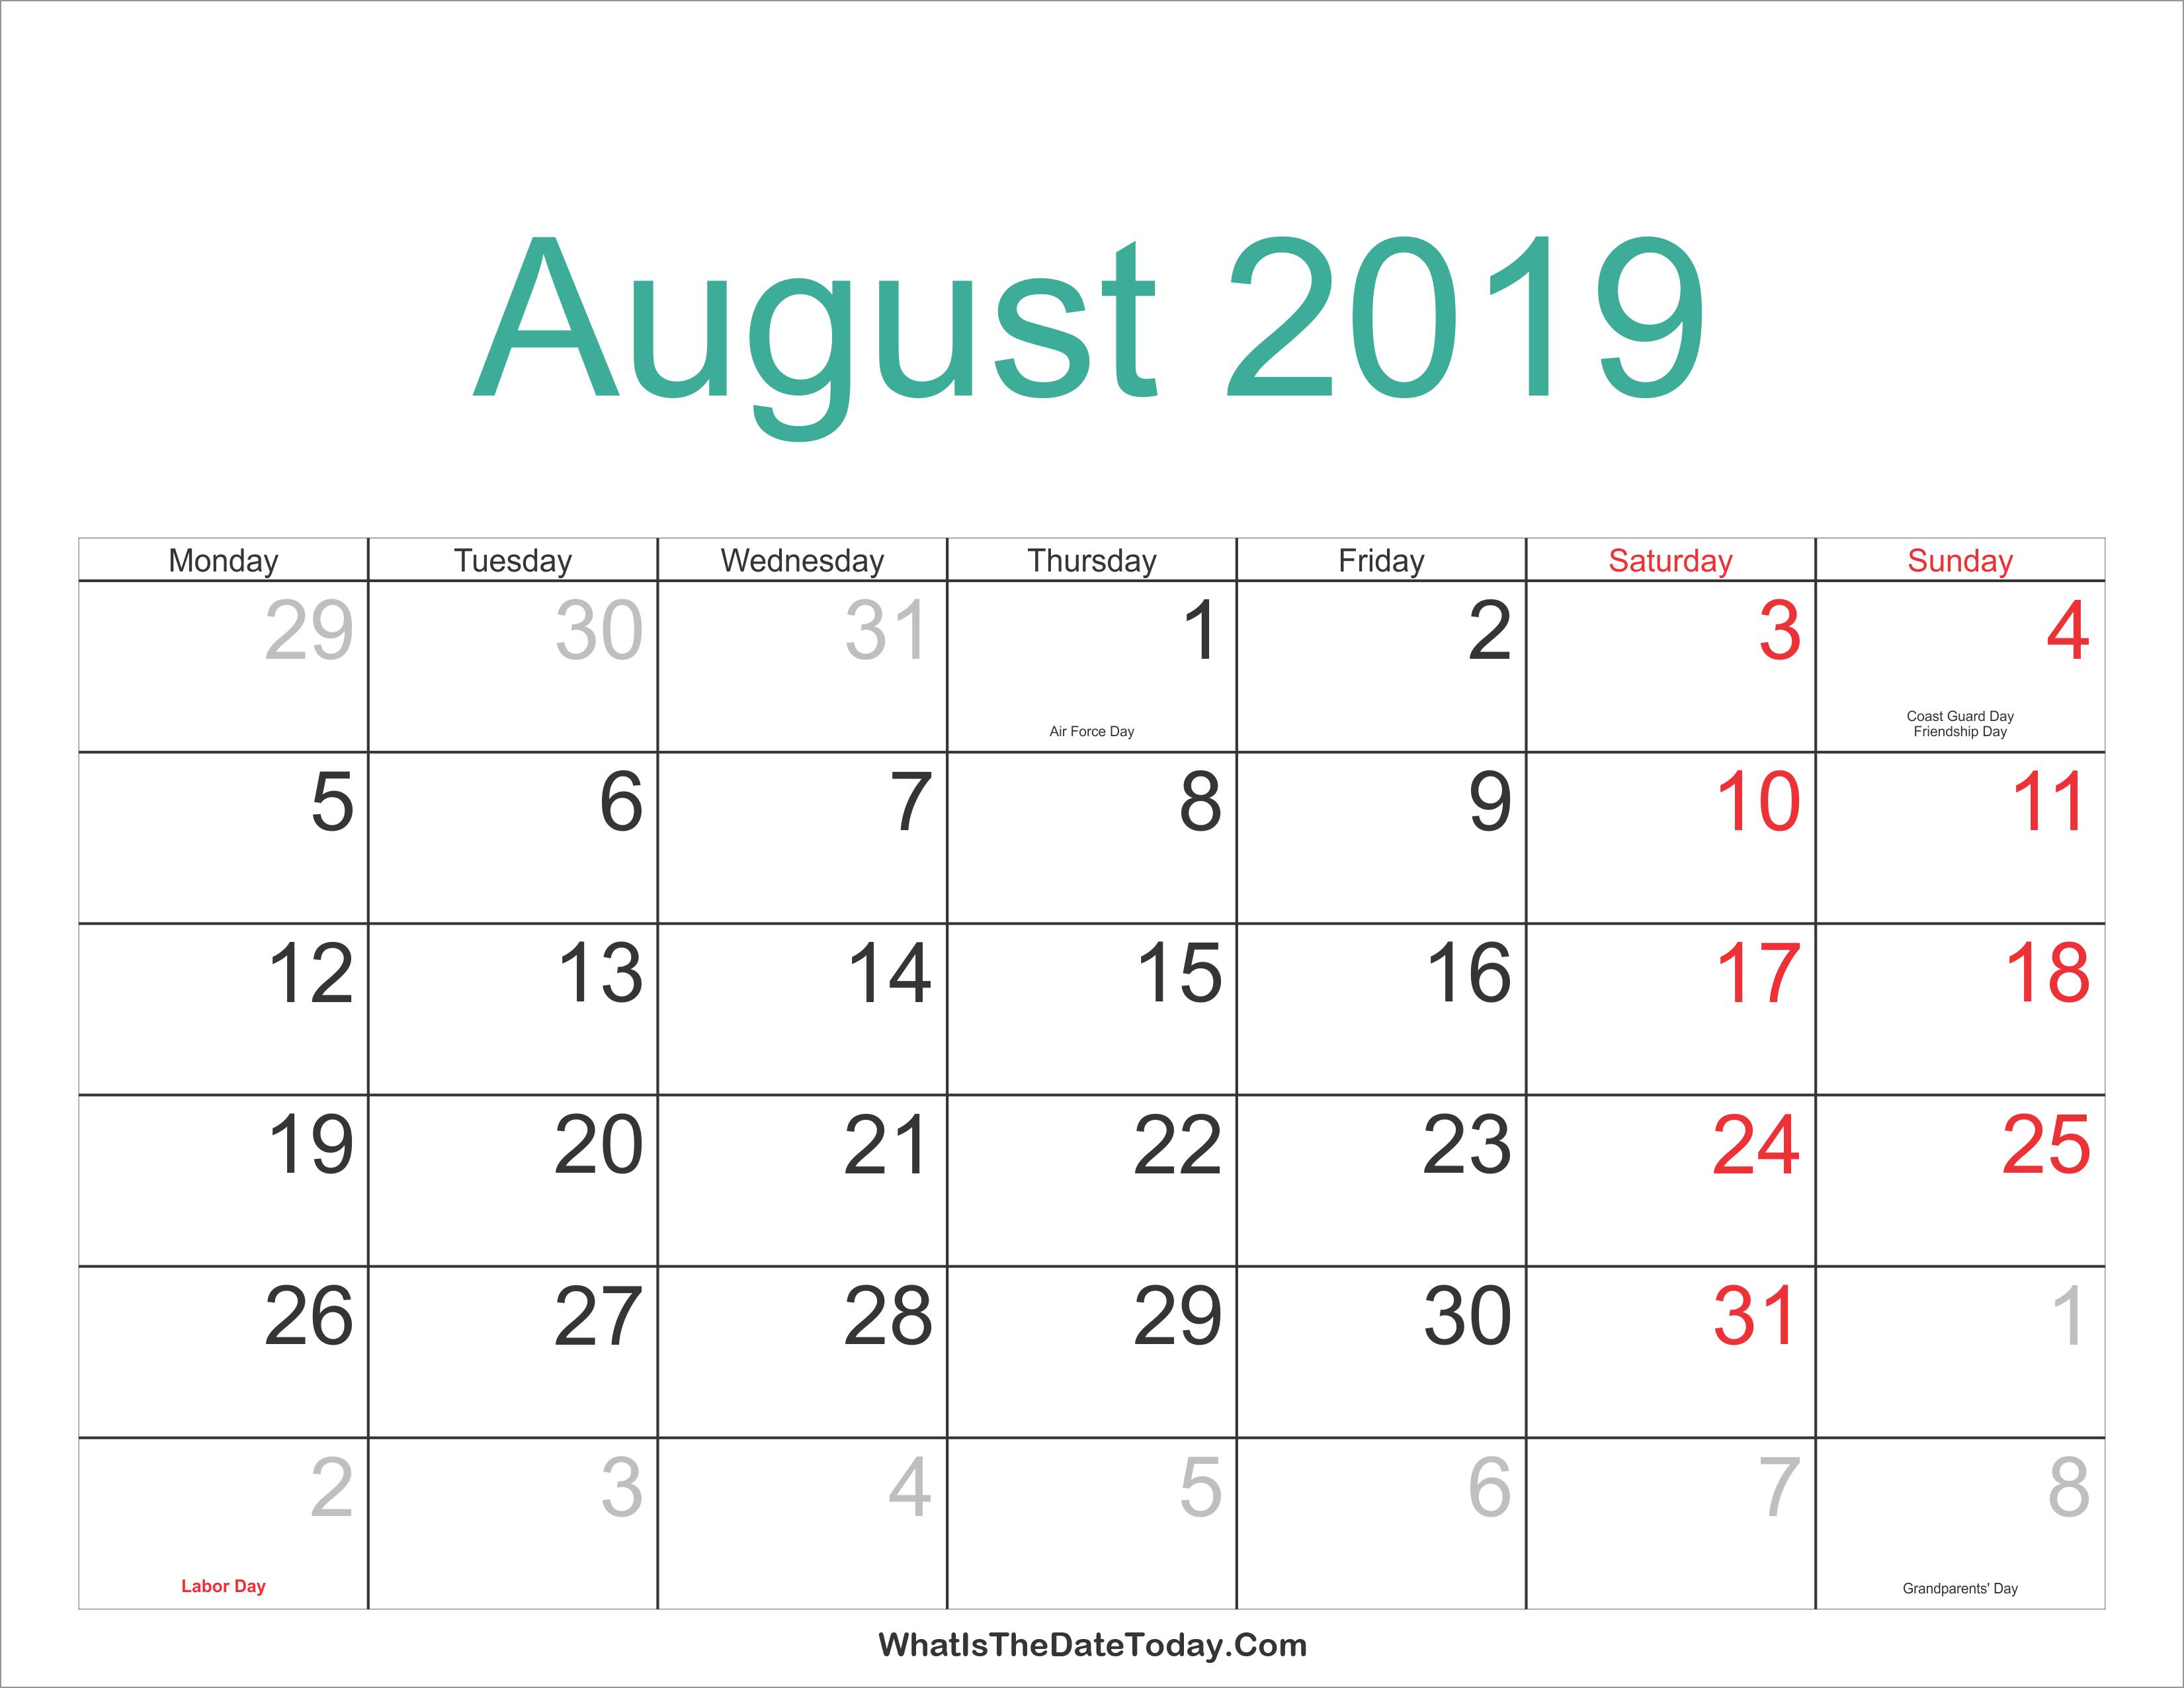 August 2019 Calendar.August 2019 Calendar Printable With Holidays Whatisthedatetoday Com